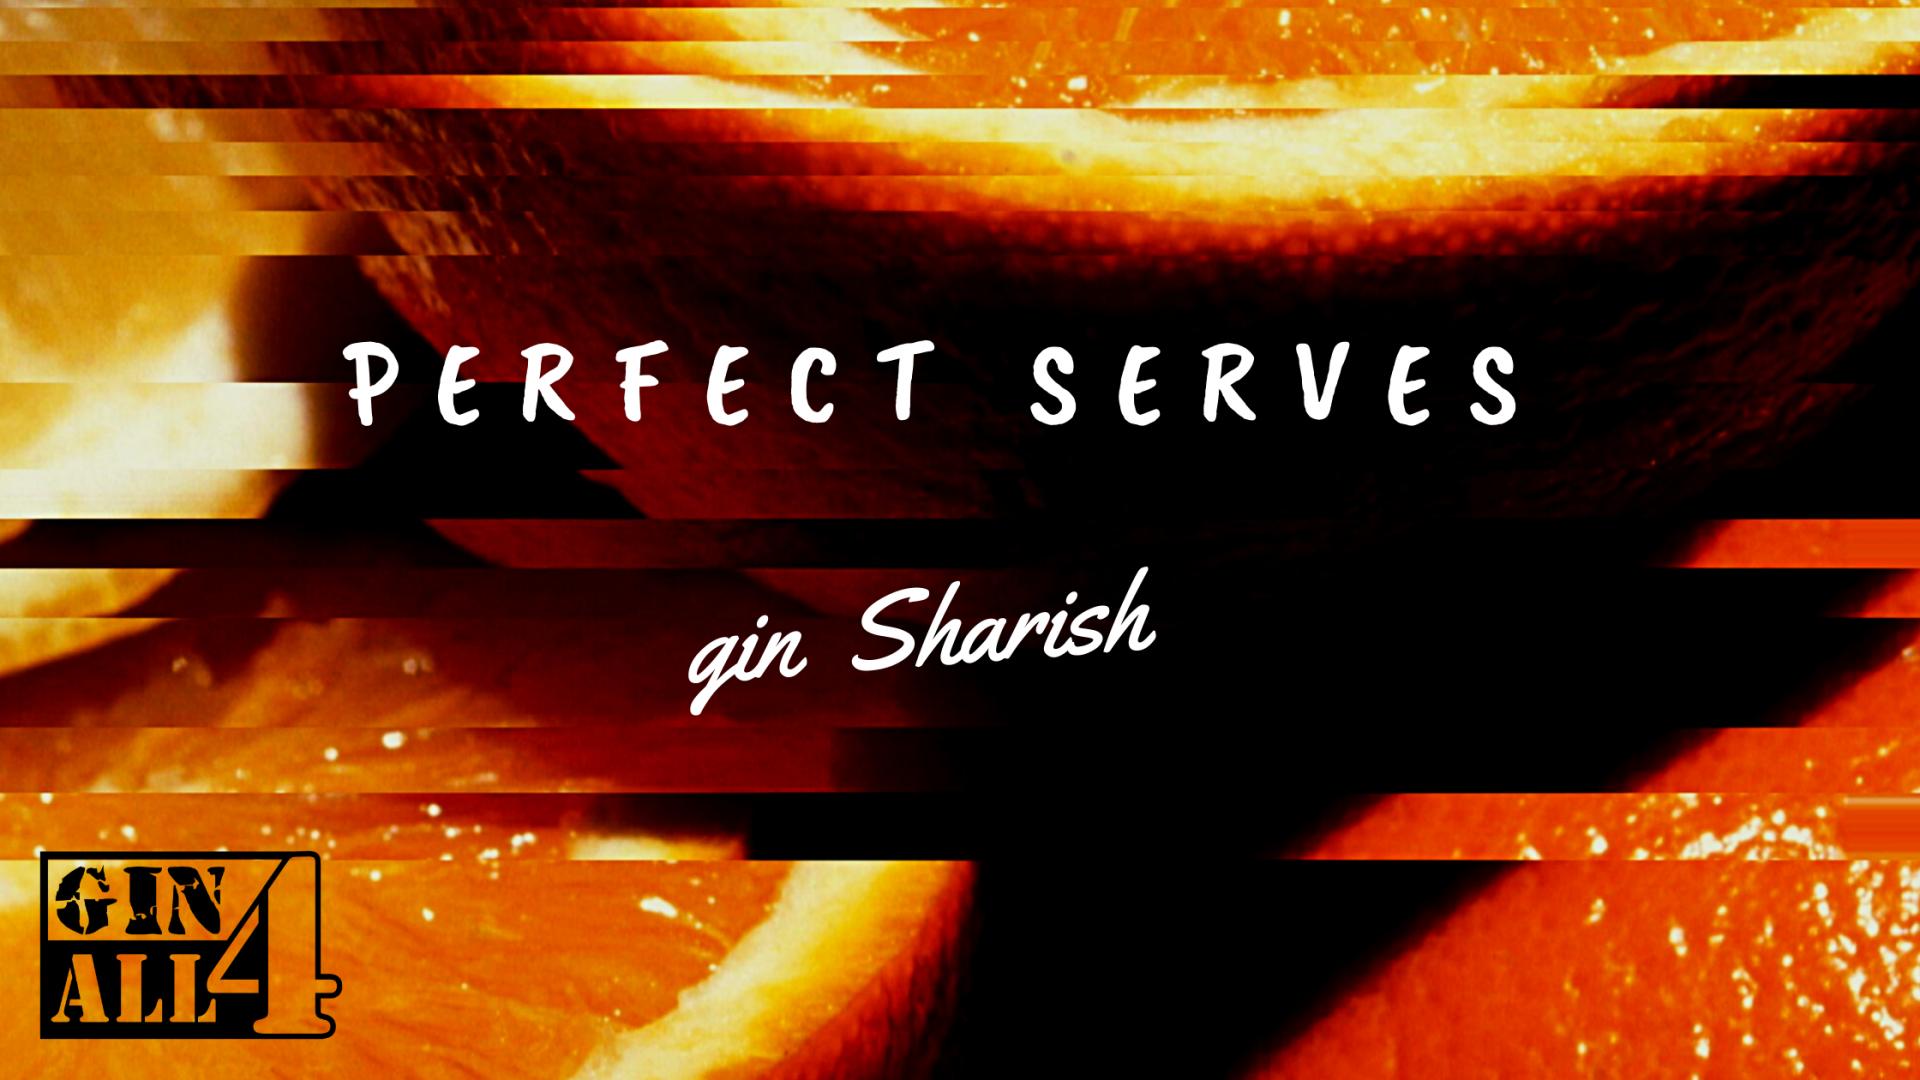 Perfect Serves - GIN SHARISH